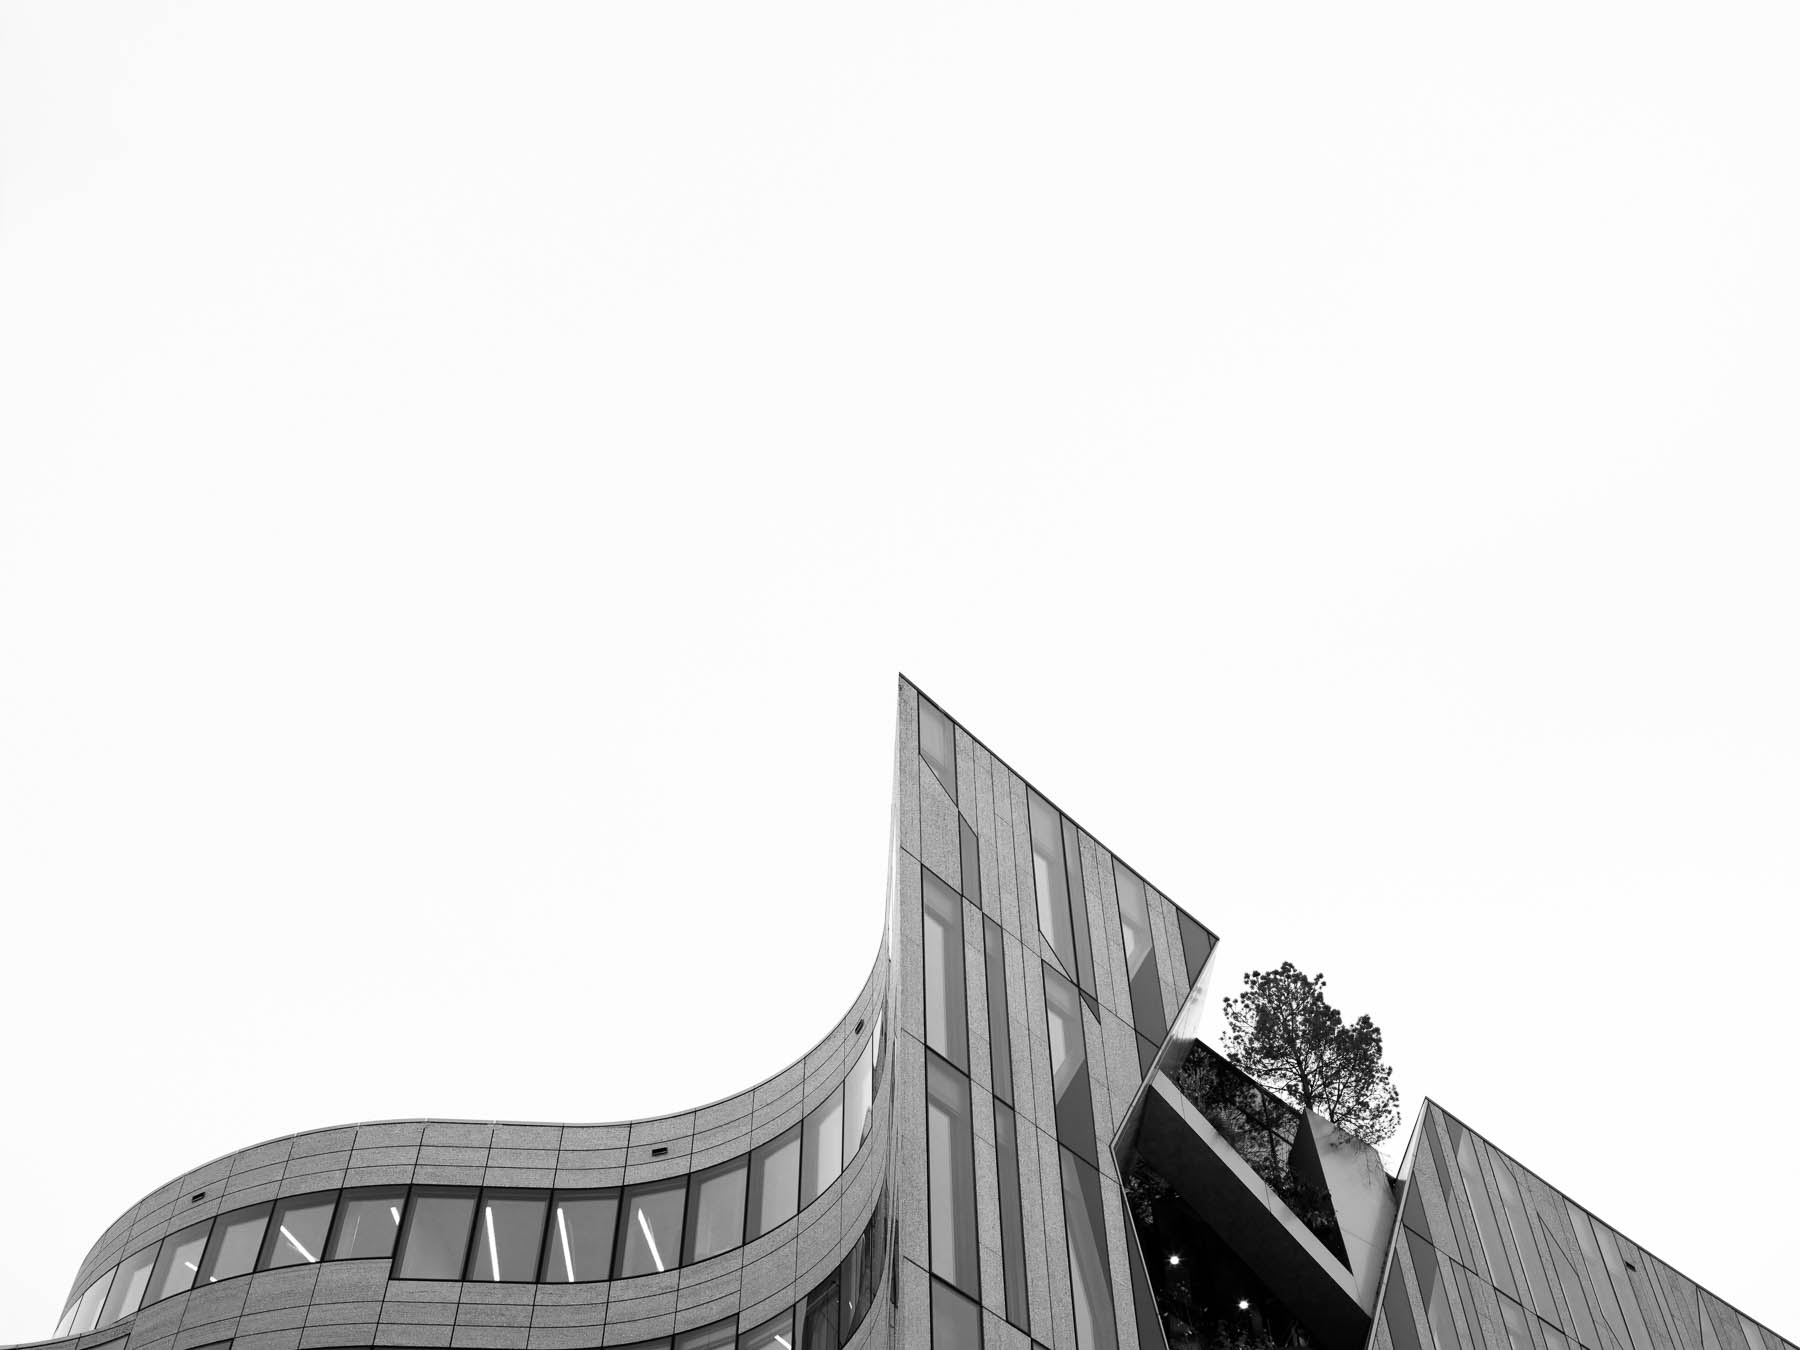 Kö-Bogen Düsseldorf, Germany